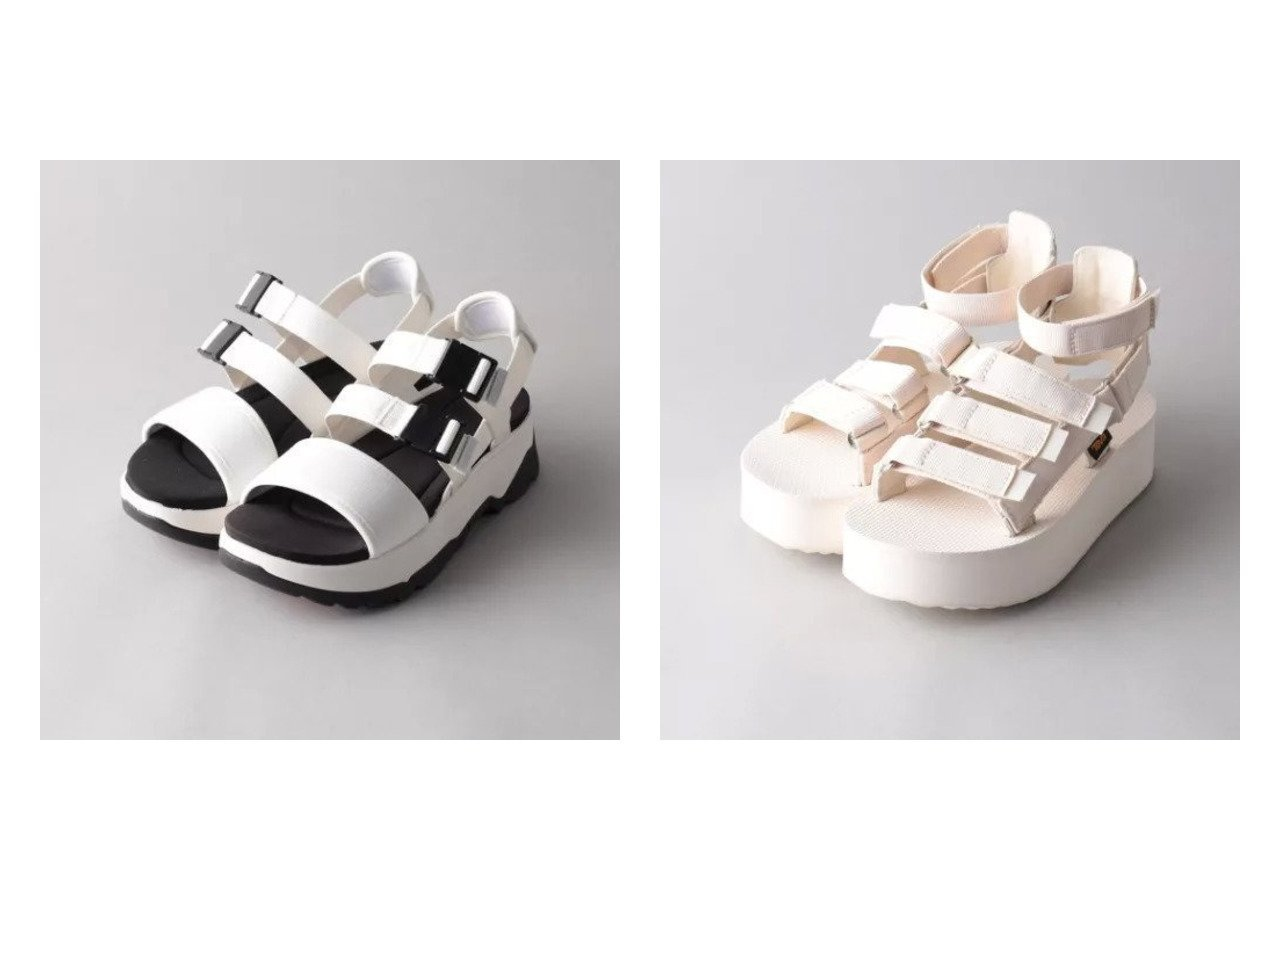 【Odette e Odile/オデット エ オディール】のTEVA JADITO SLINGBACK&TEVA FLATFORM MEVIA 【シューズ・靴】おすすめ!人気、トレンド・レディースファッションの通販 おすすめで人気の流行・トレンド、ファッションの通販商品 メンズファッション・キッズファッション・インテリア・家具・レディースファッション・服の通販 founy(ファニー) https://founy.com/ ファッション Fashion レディースファッション WOMEN S/S・春夏 SS・Spring/Summer サンダル シューズ スポーツ ラップ 人気 厚底 春 Spring  ID:crp329100000030396